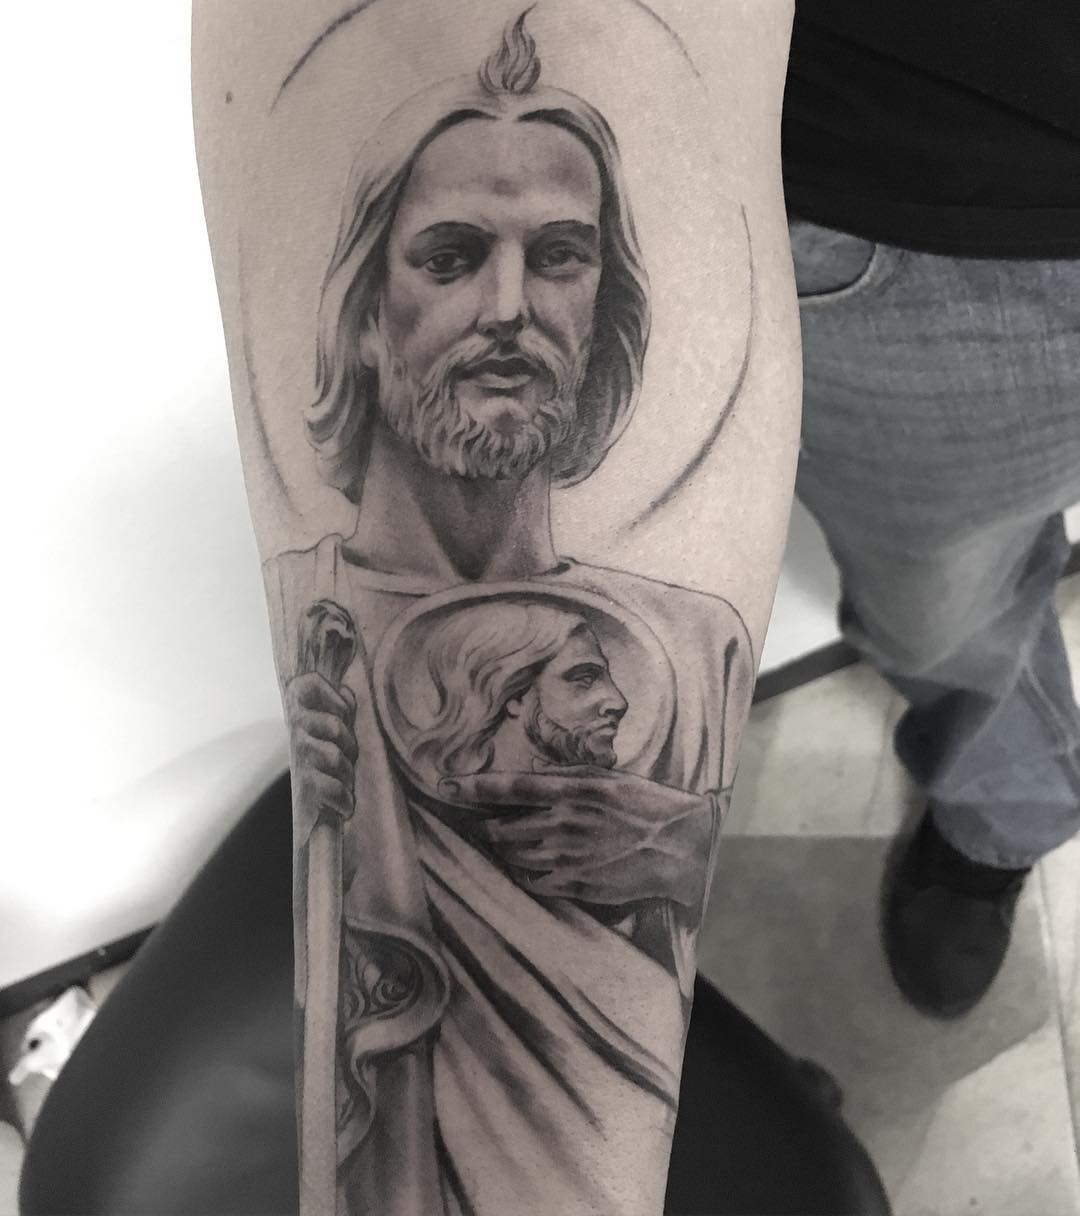 tatuajes-sa-judas-tadeo-11